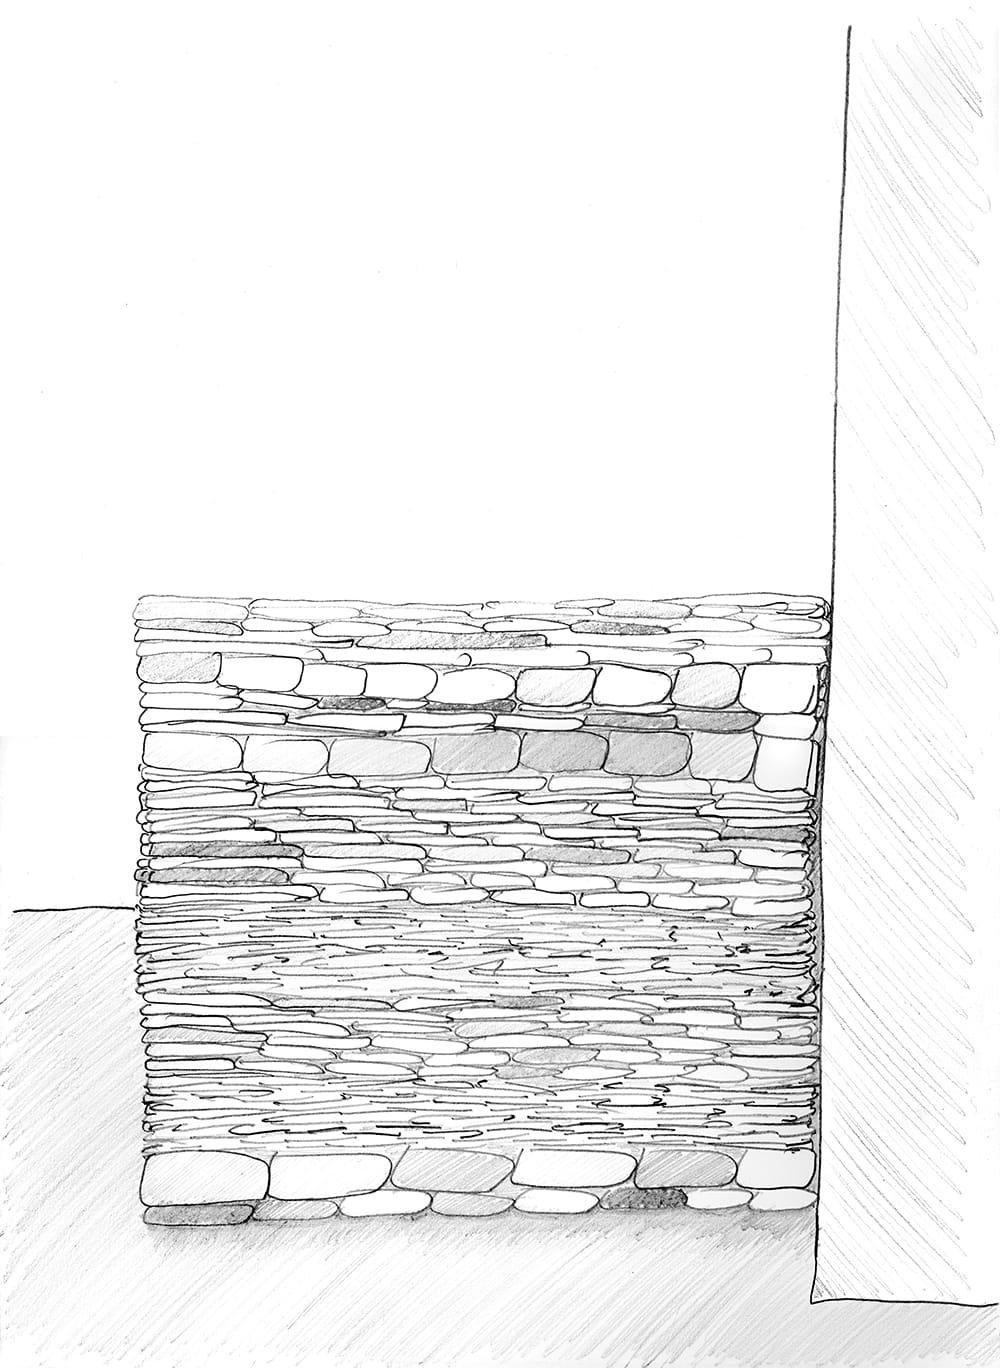 Clothing Wall, 2003